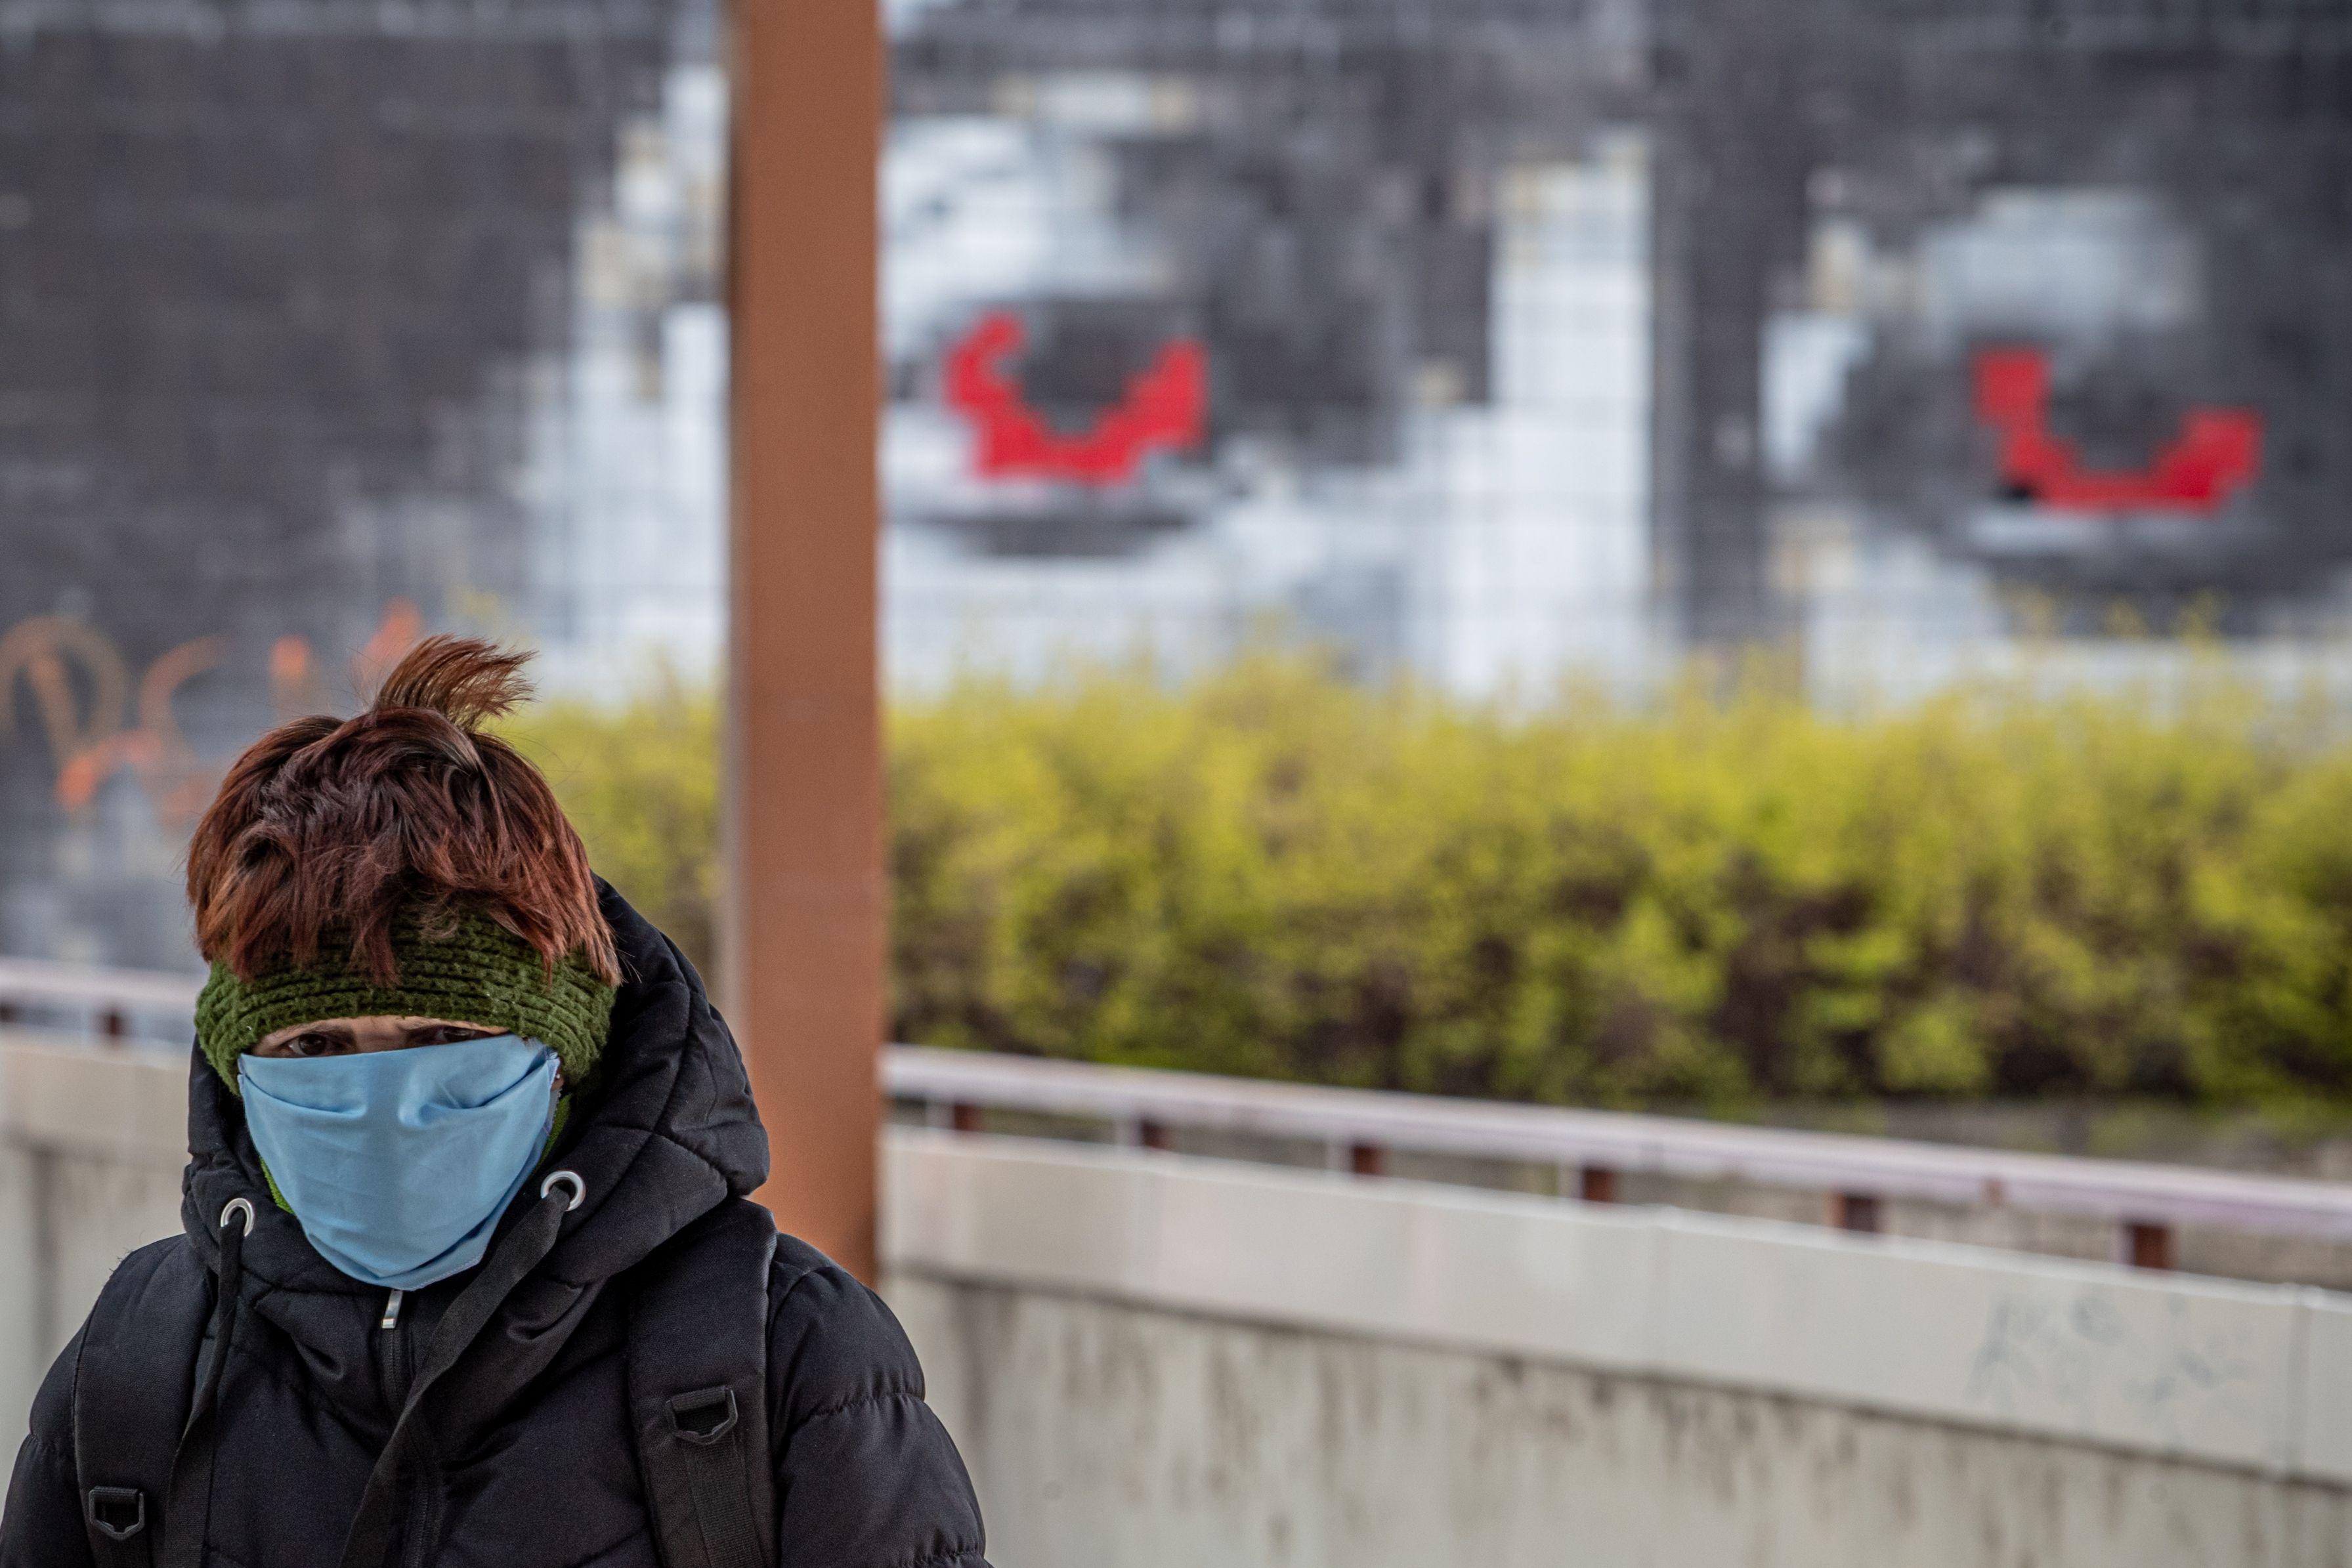 DIY masks for all could help stop coronavirus - The Washington Post